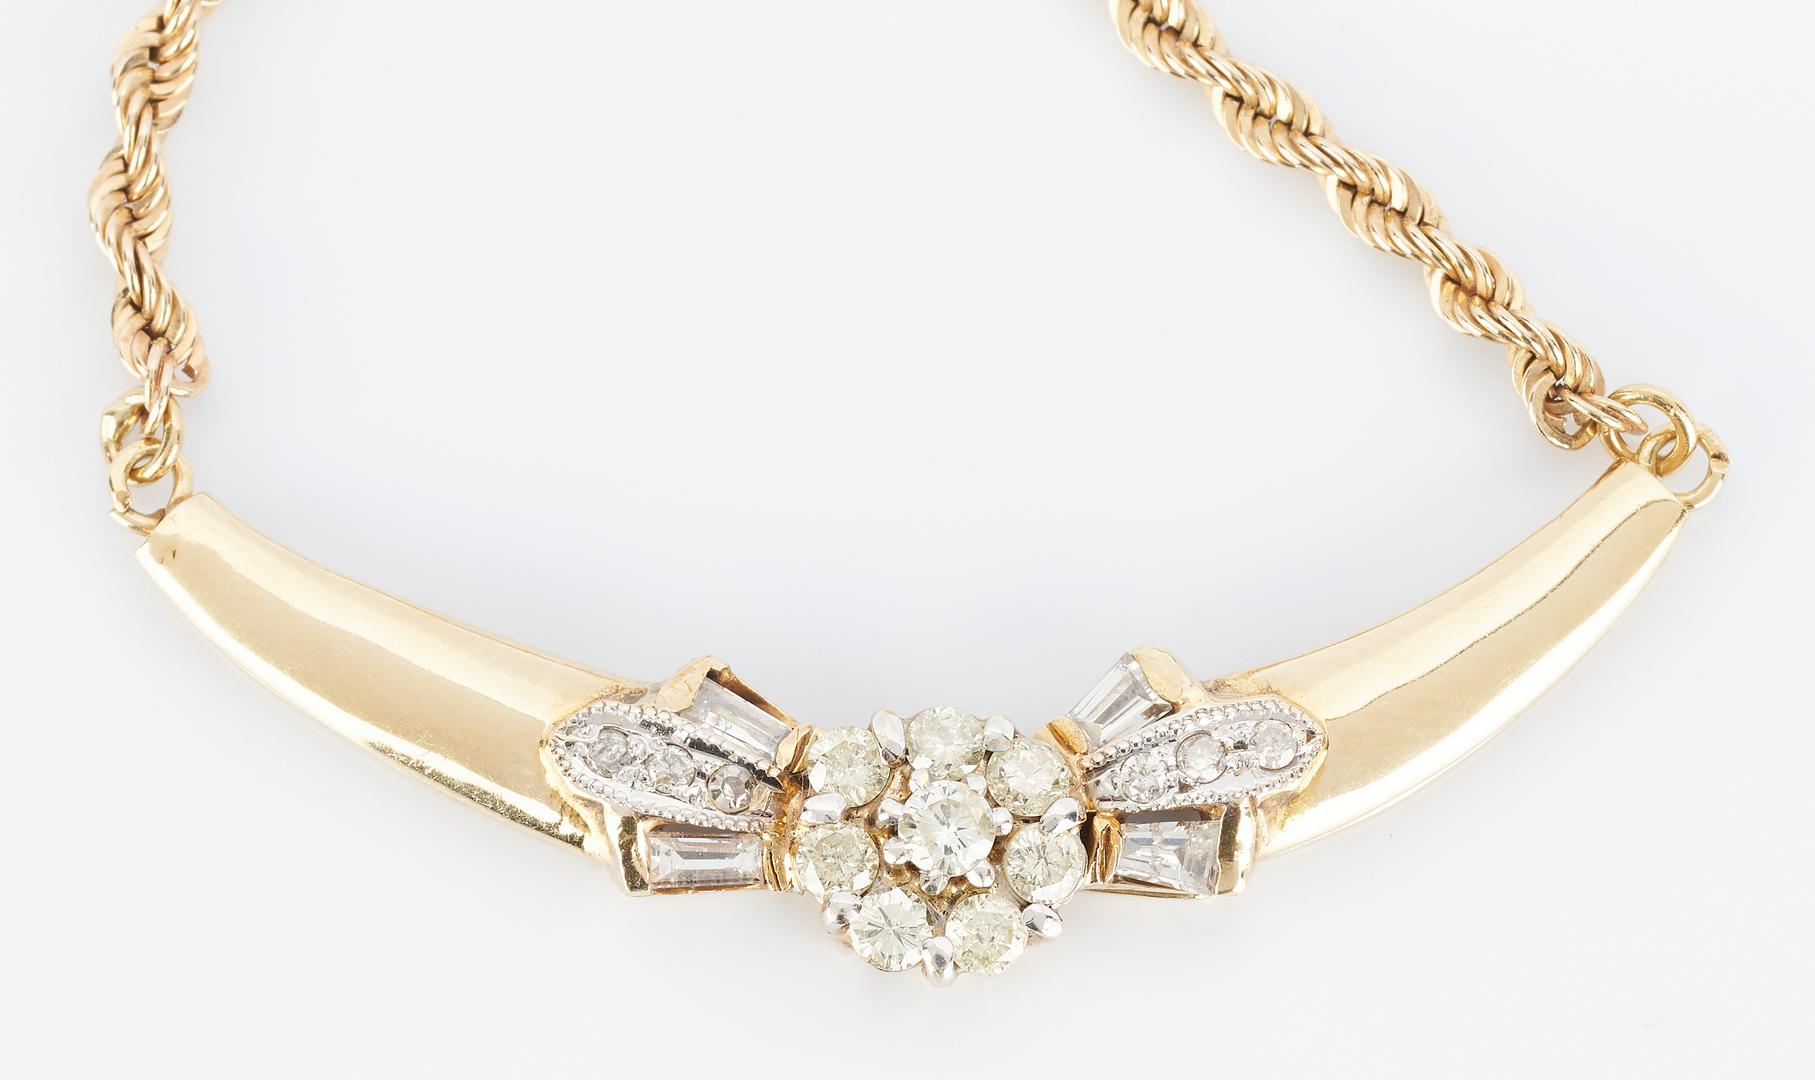 Lot 840: 14K Diamond Pendant Necklace